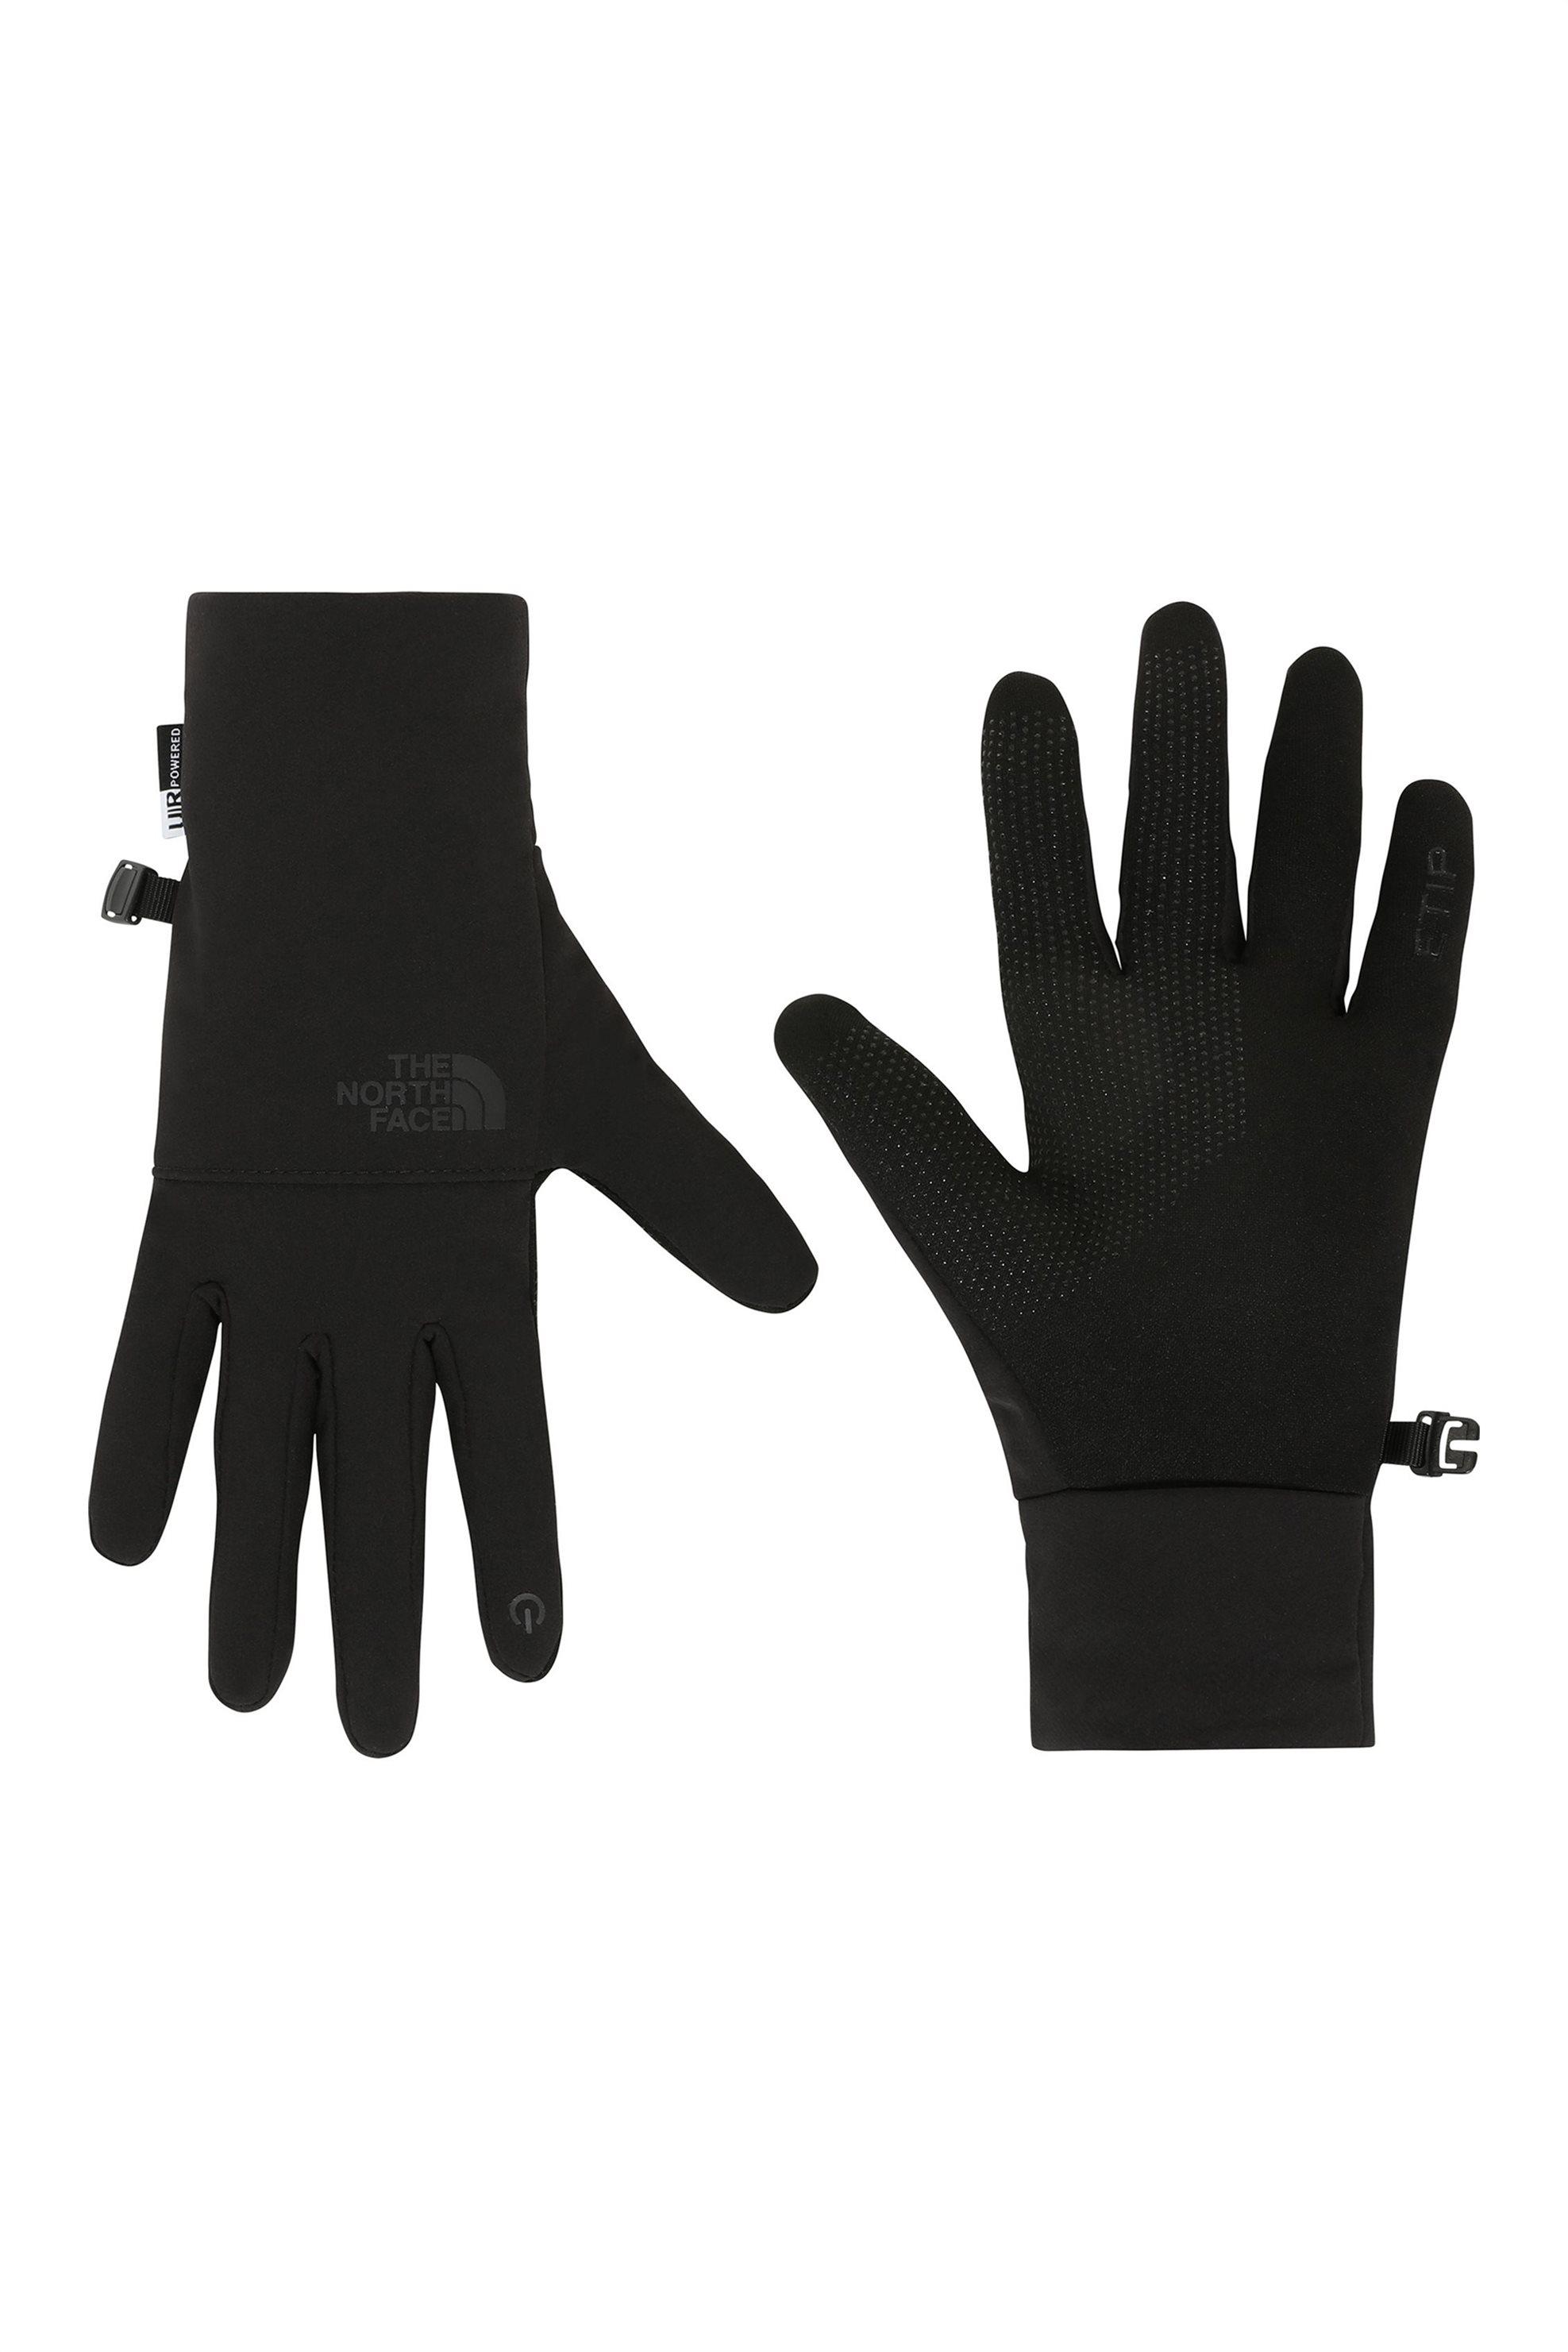 The North Face γυναικεία γάντια ''Etip'' - NF0A4SFUJK31 - Μαύρο